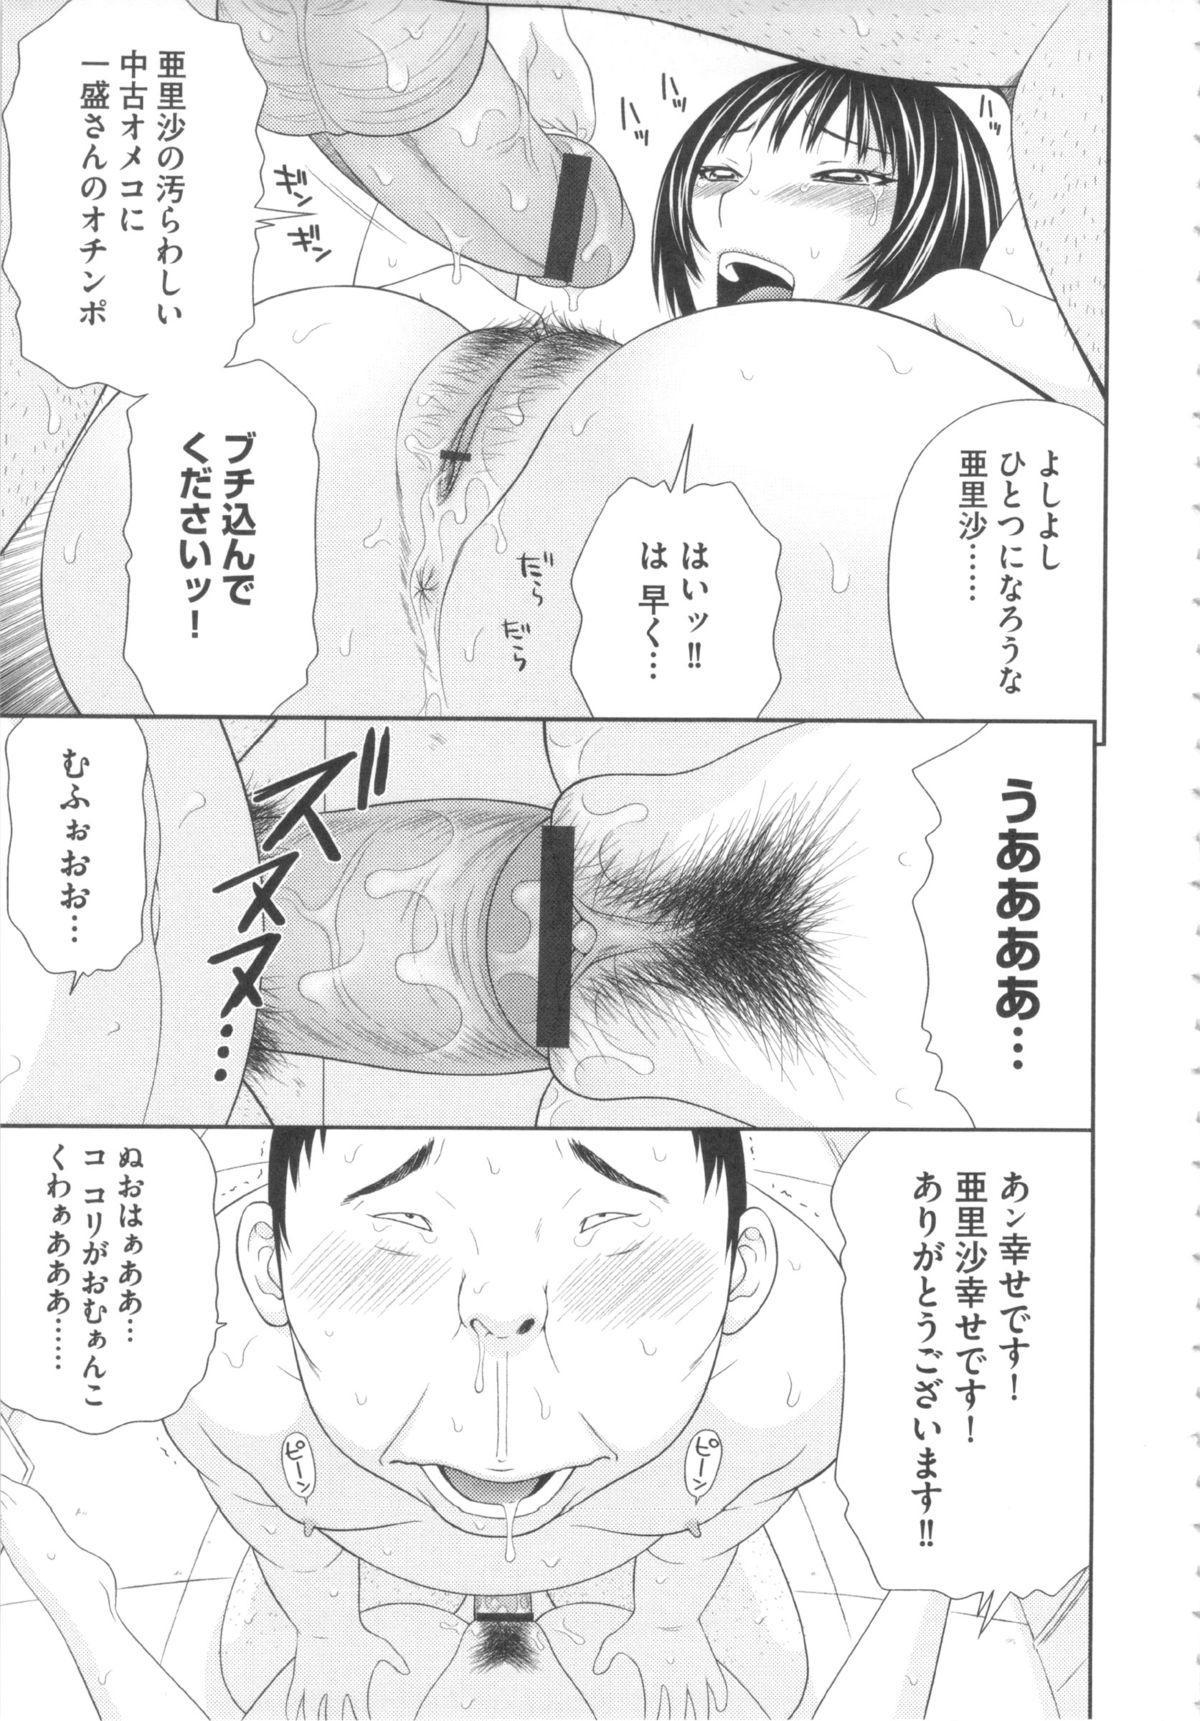 Kiseki No Zaajiru - Sperm of Miracle 19